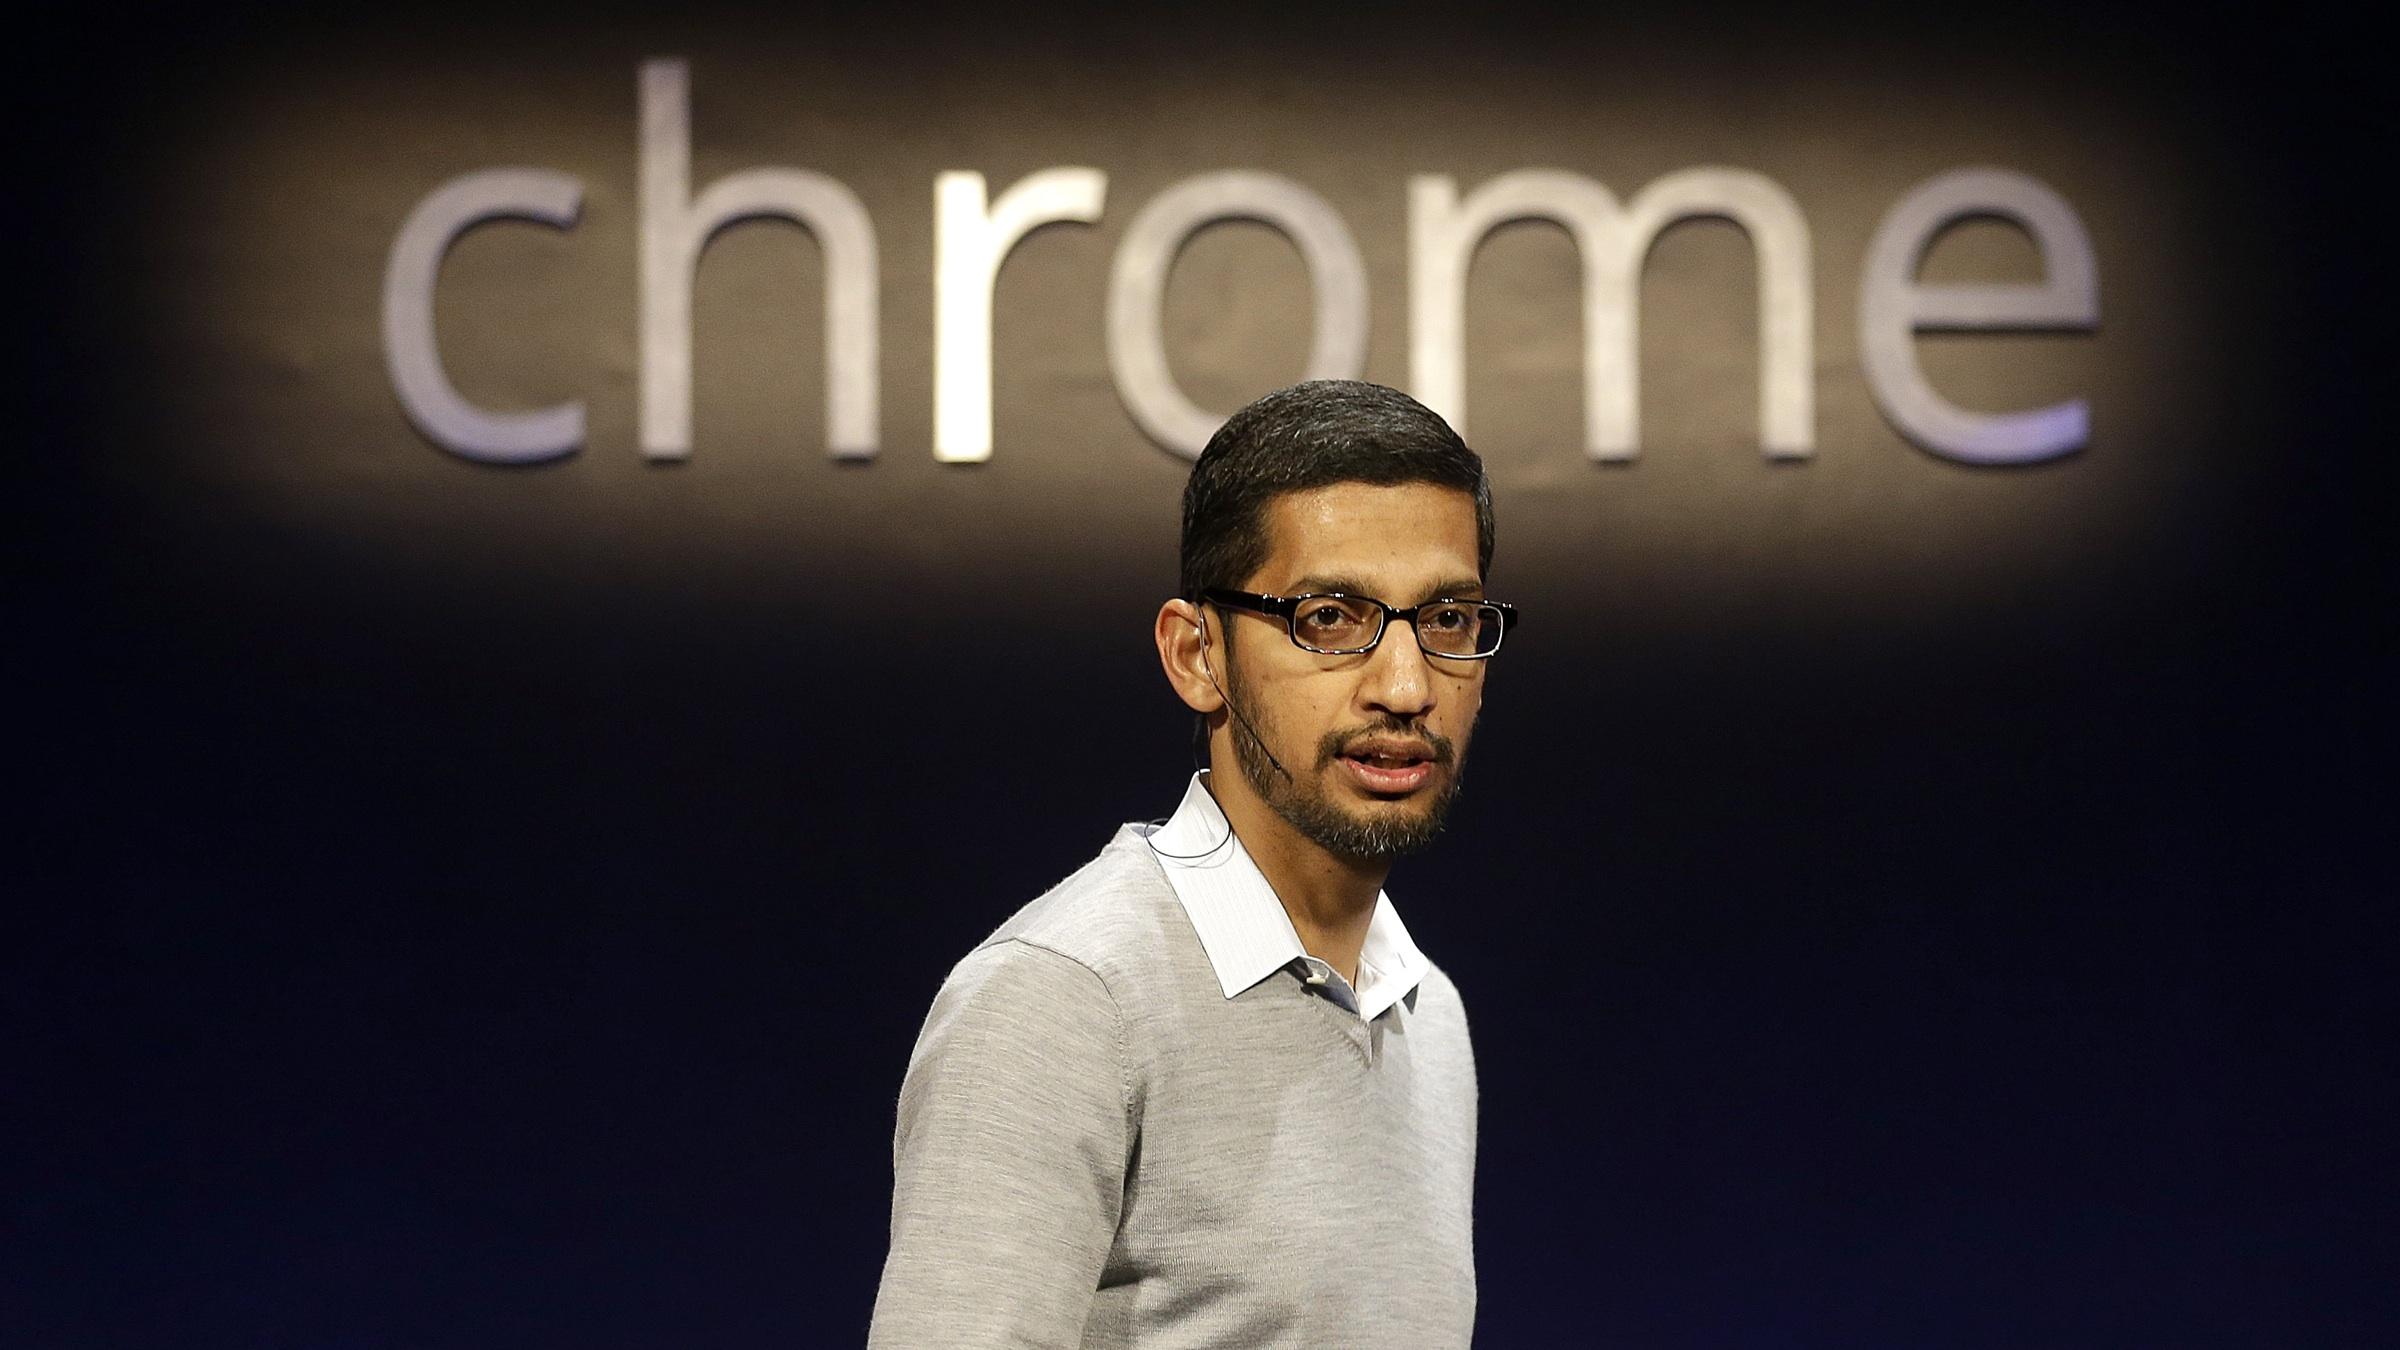 Sundar Pichai, Google's senior vice president of Chrome and apps, speaks at an announcement in San Francisco, Thursday, Feb. 21, 2013. (AP Photo/Jeff Chiu)